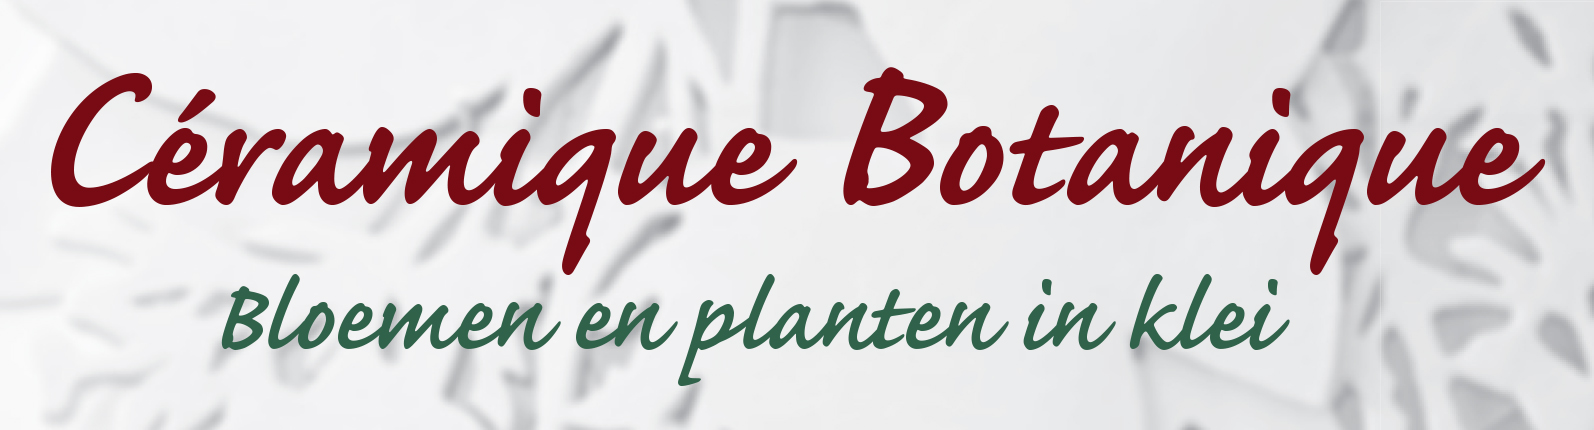 KTT flyer Ceramique botanique_DEFDRUK.indd